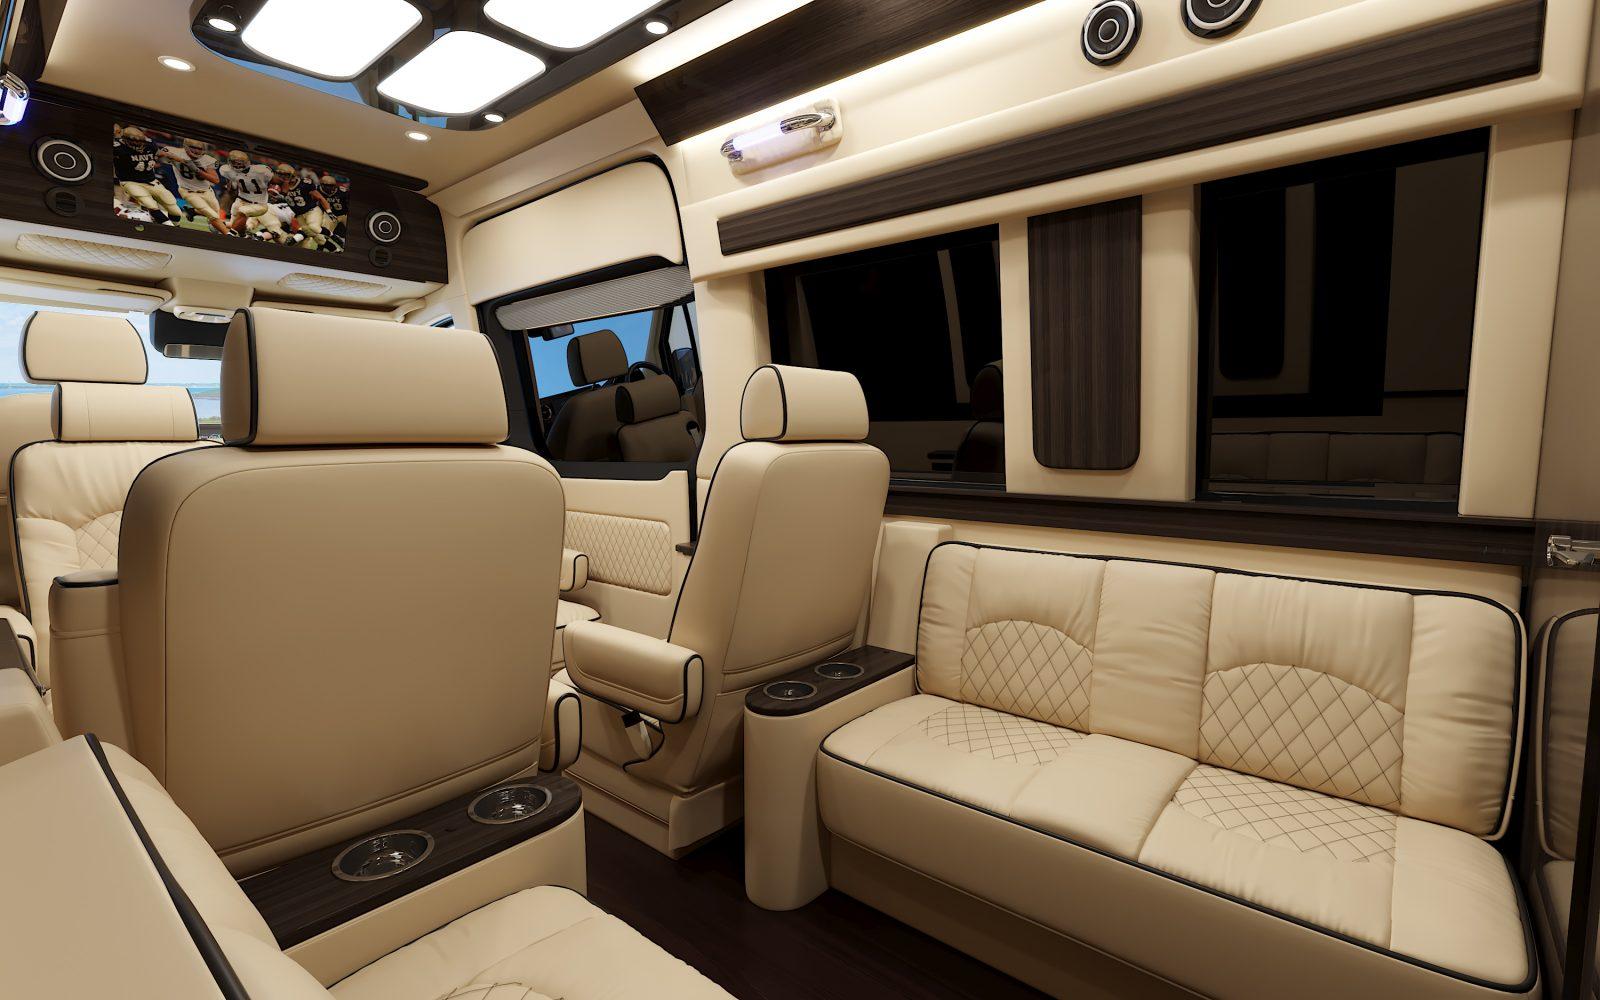 Mercedes Benz Luxury Sprinter Van Ultimate Toys Presidential 2020